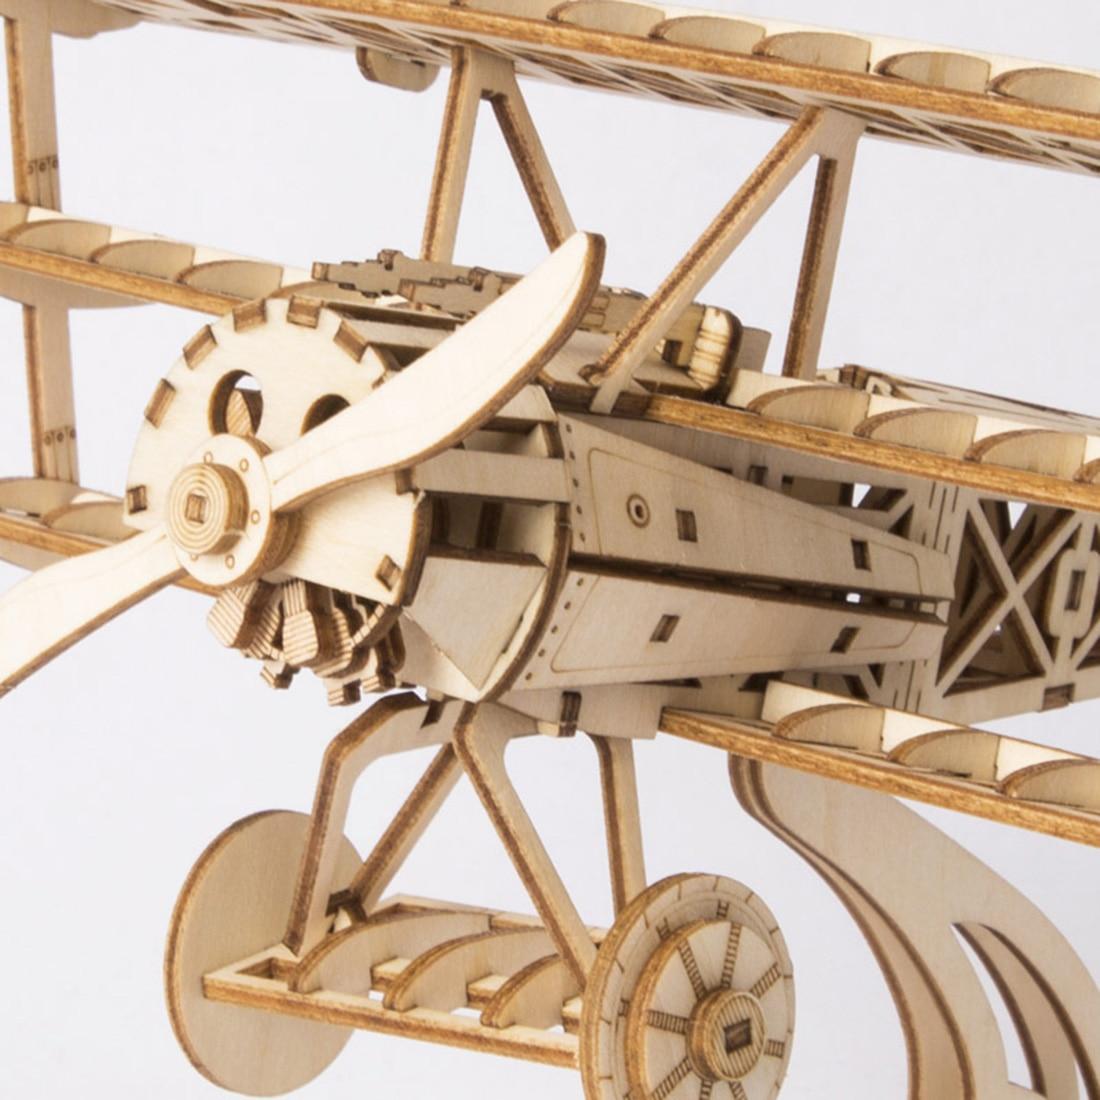 3D Movement Assembled Wooden Painting DIY Laser Cutting Model Steam Stem Toys - Bi-Plane3D Movement Assembled Wooden Painting DIY Laser Cutting Model Steam Stem Toys - Bi-Plane